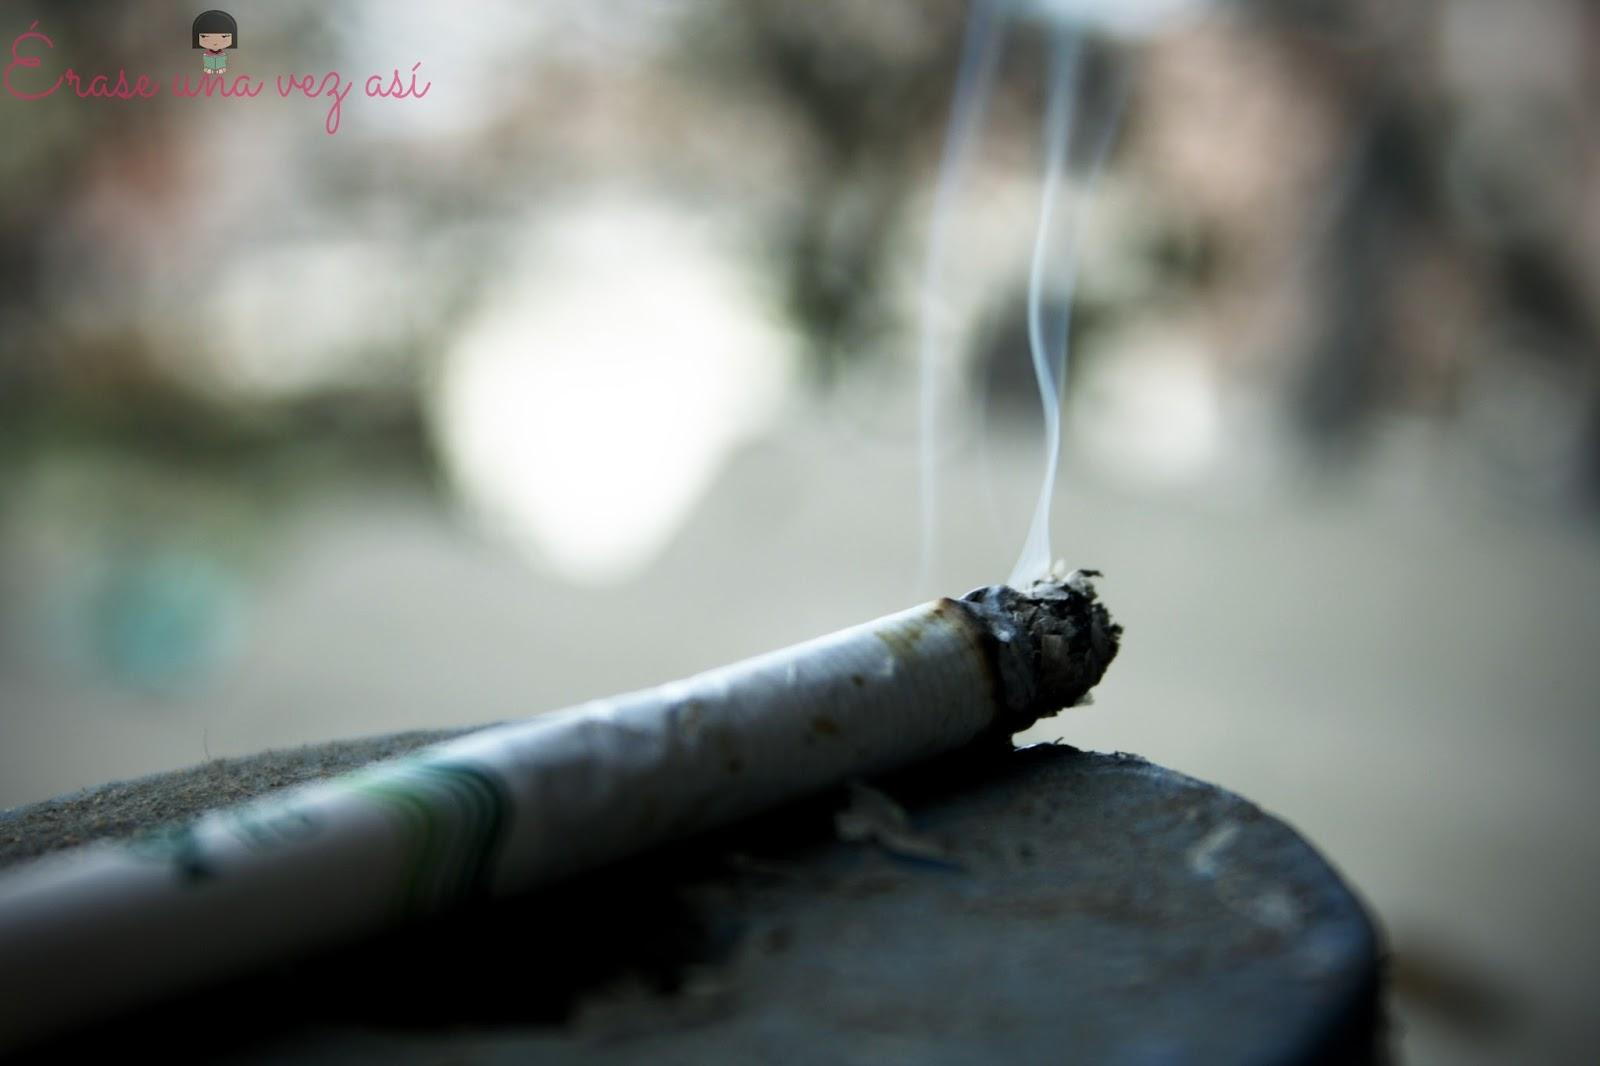 cigarro, fotografia de cigarrillo, olvidar, erase una vez asi, frases de amor, frases para el face